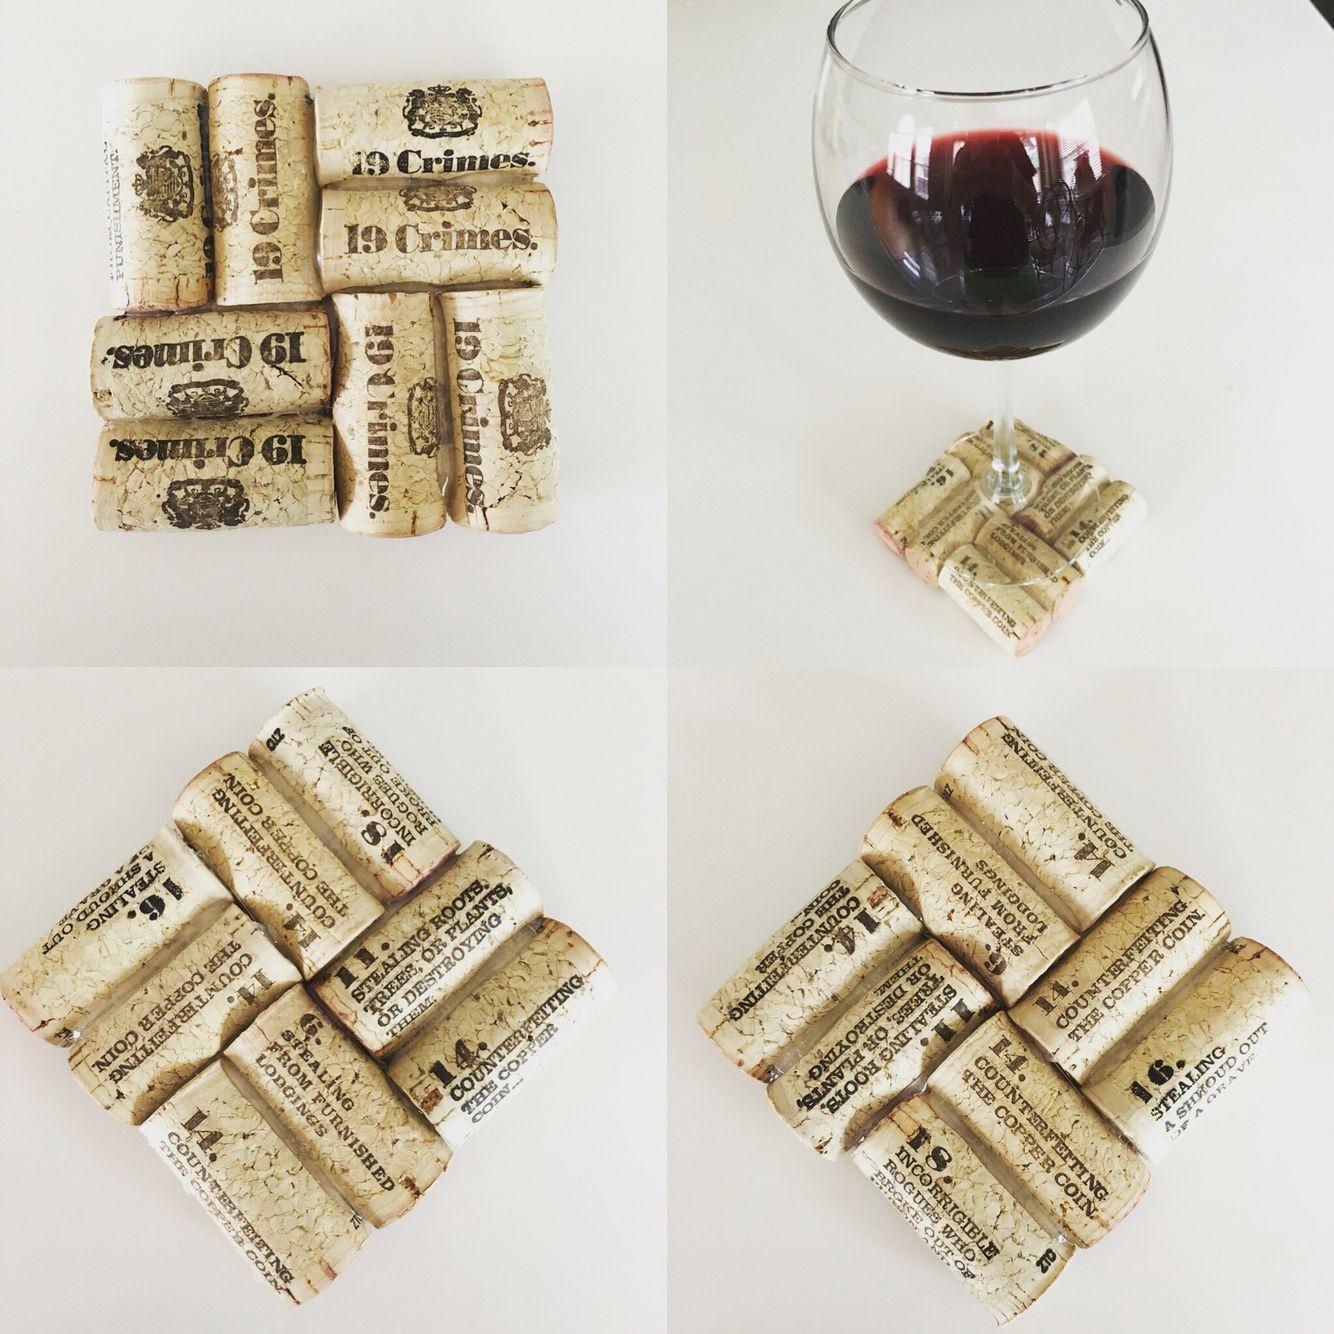 19 crimes corks